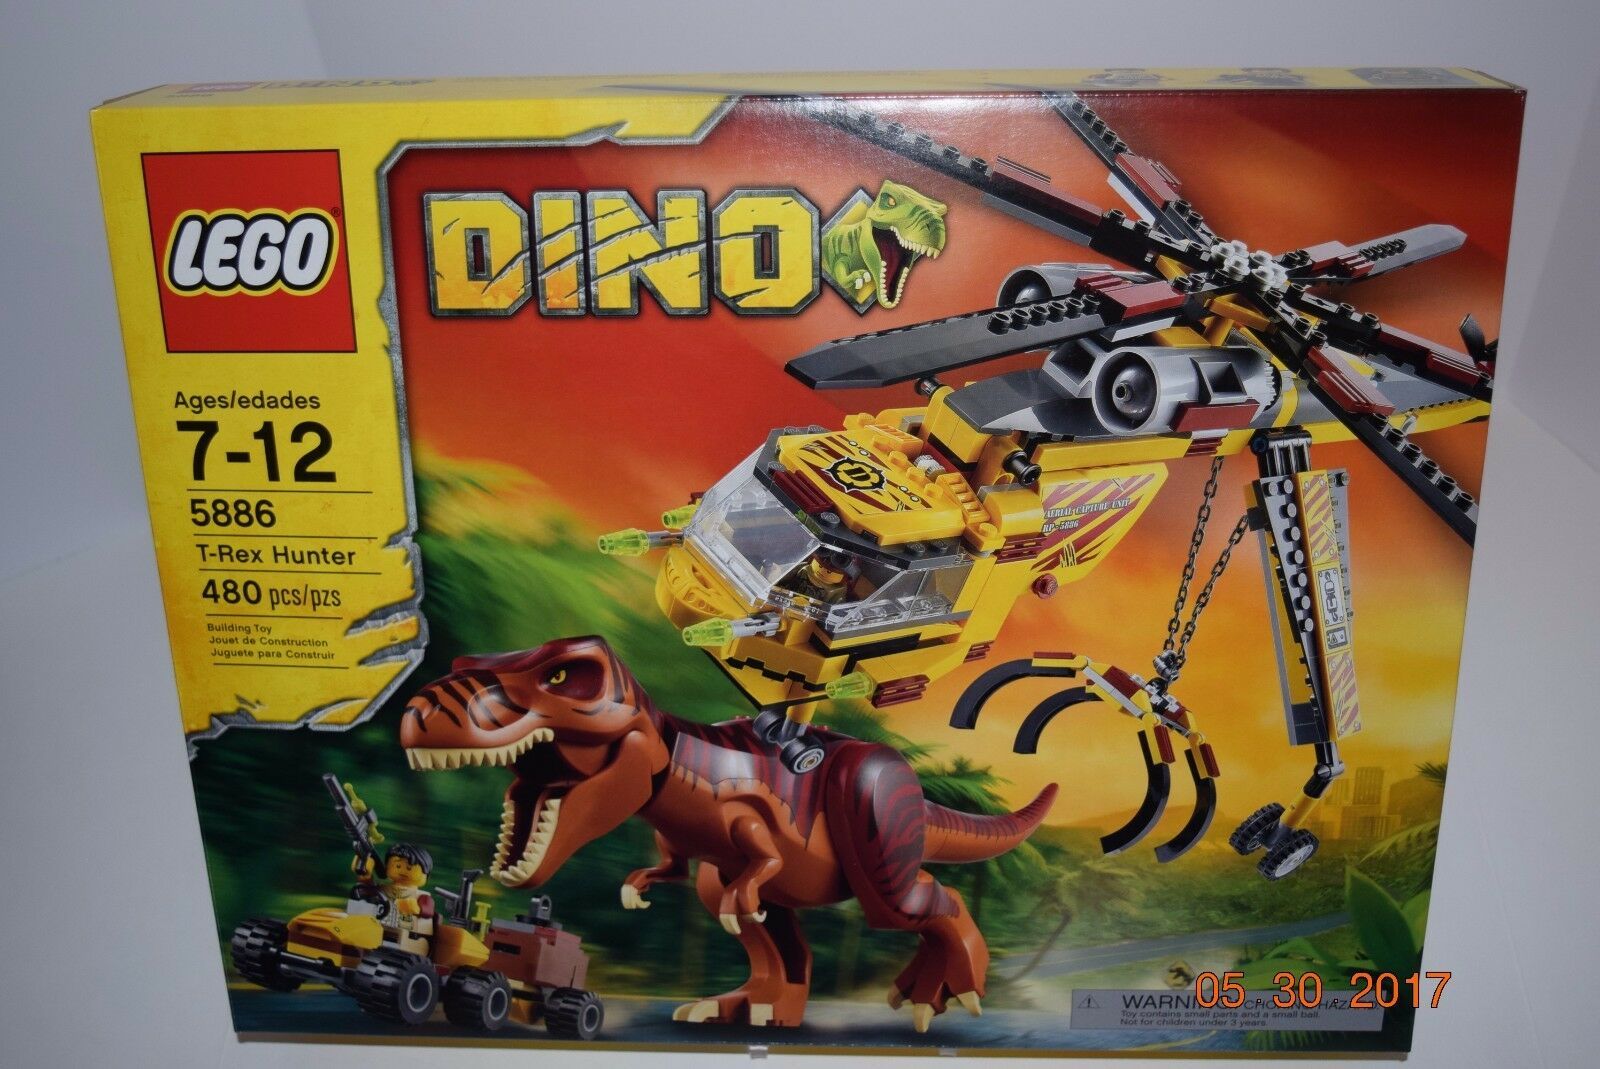 Lego 5886  DINO T-REX Hunter   480 pcsRetirougeRead Desc58845885Sealednouveau  prix bas 40%